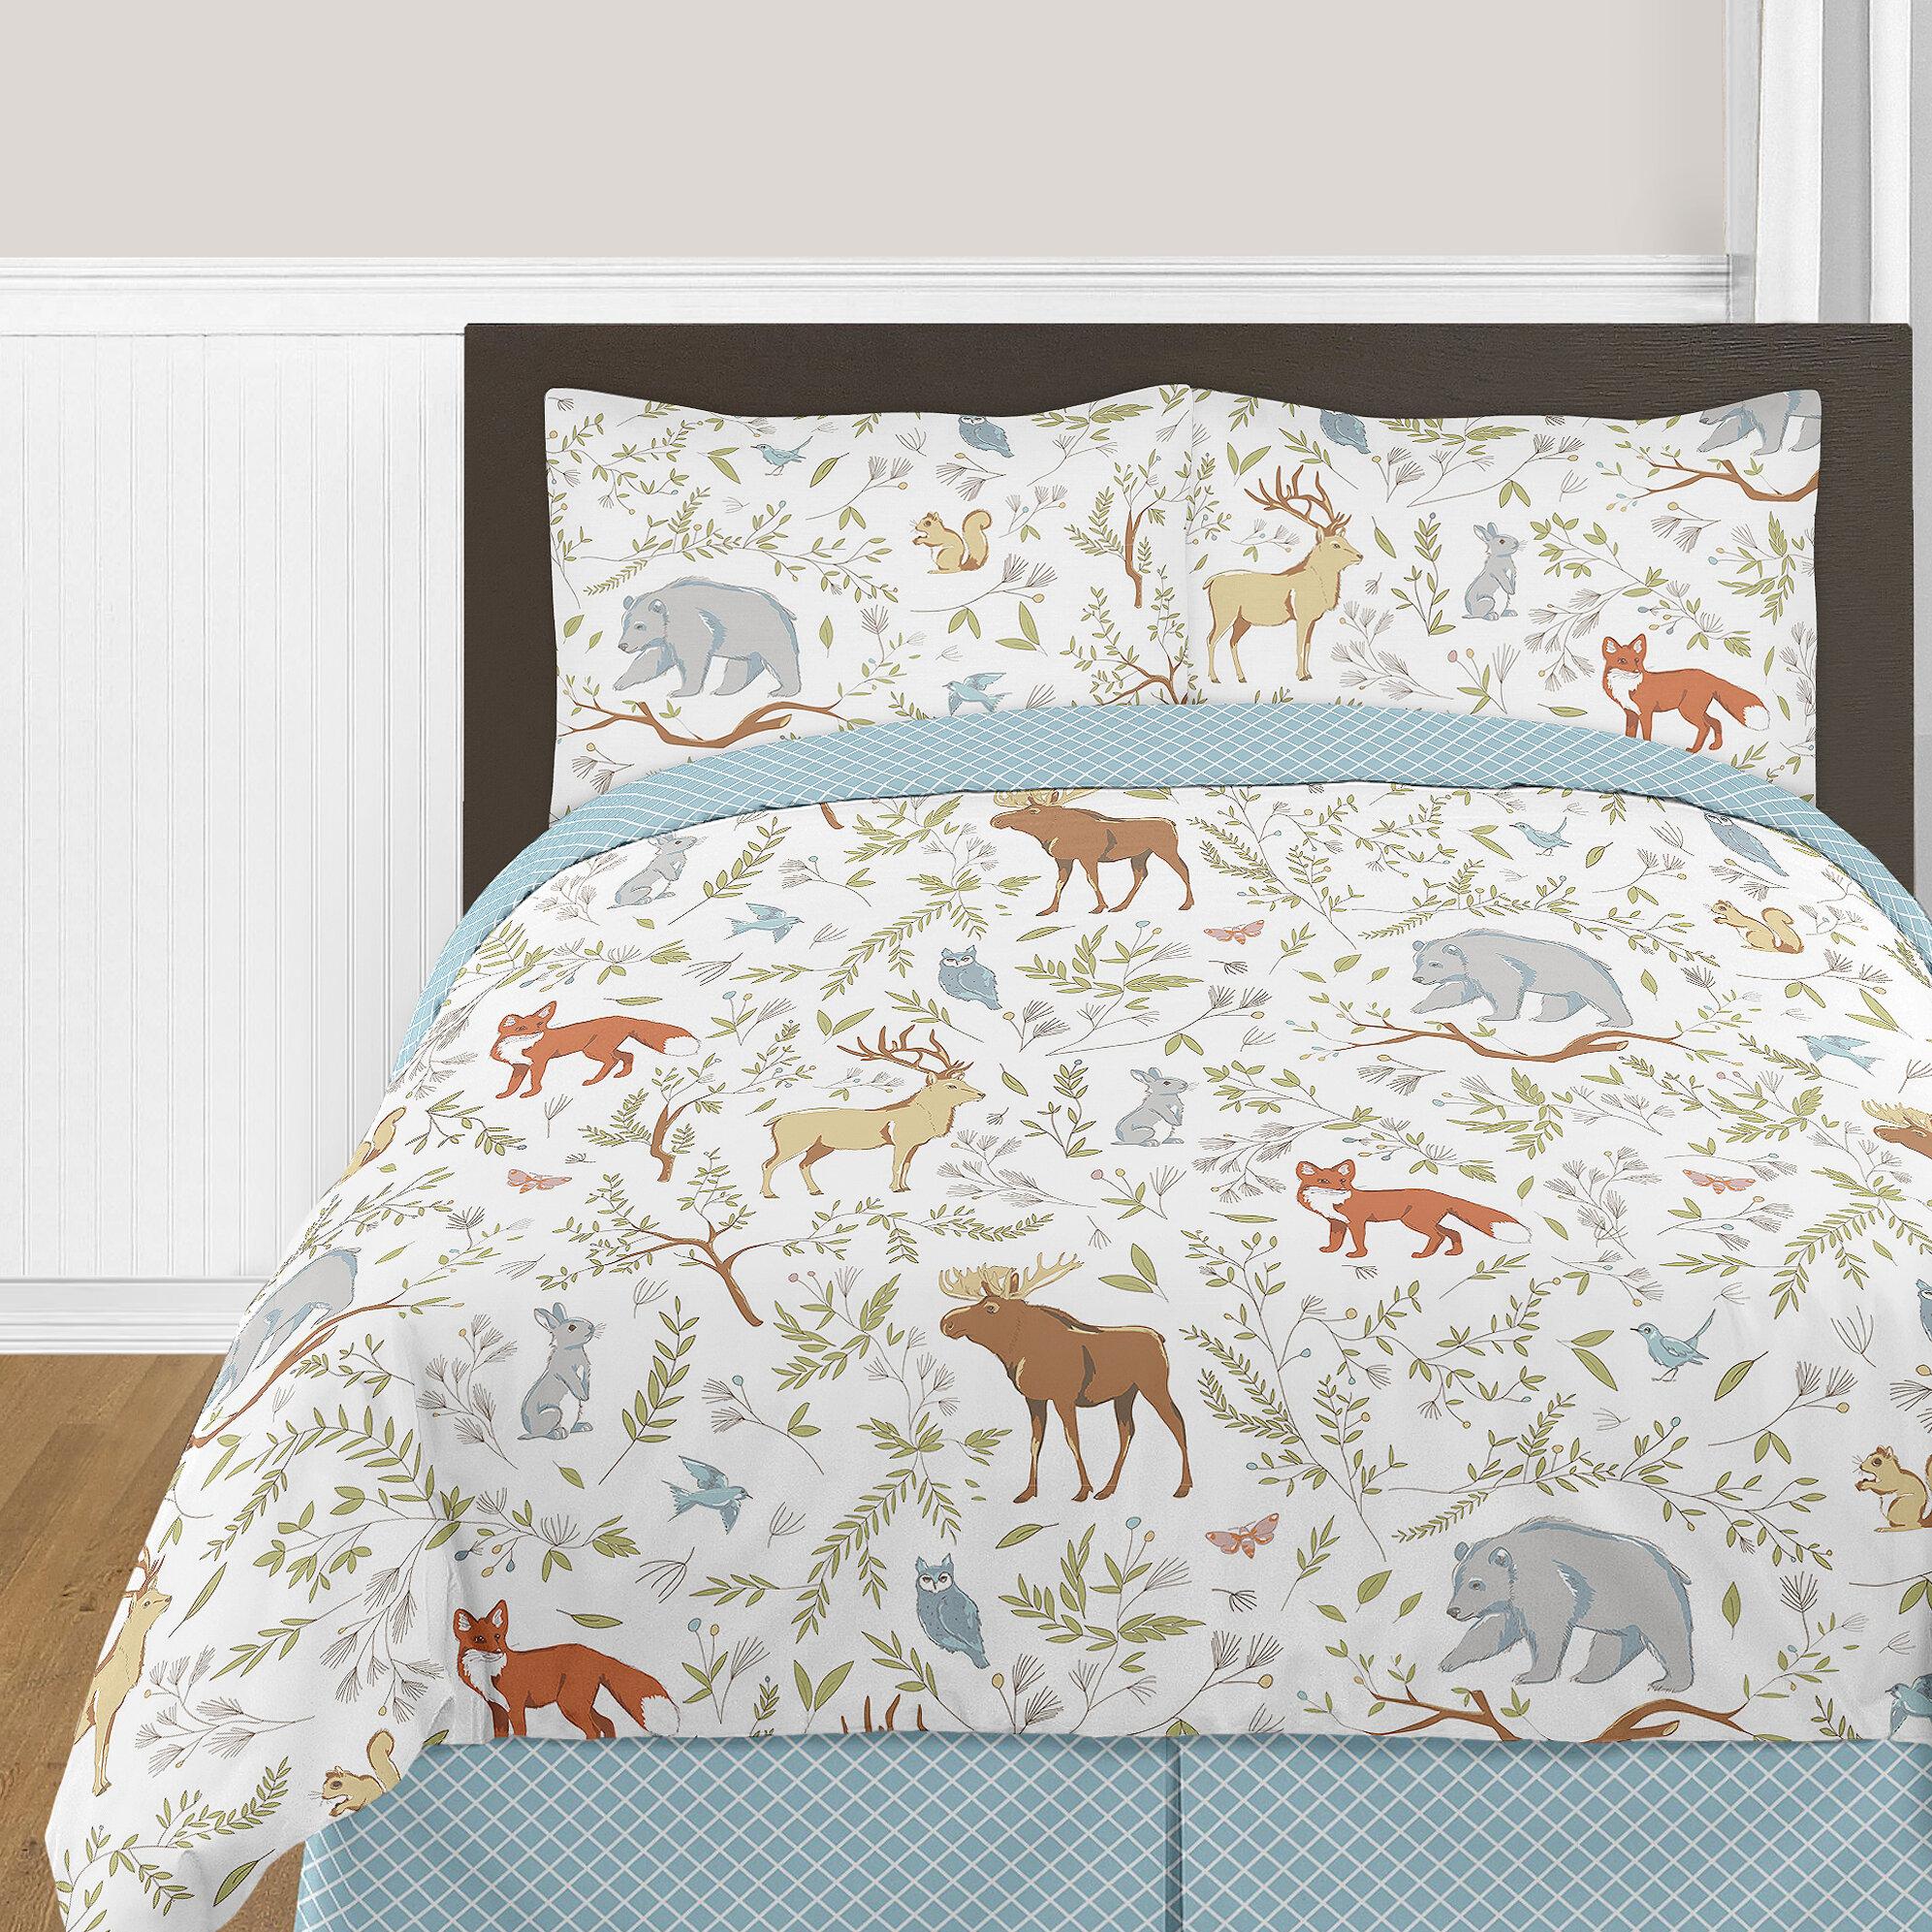 Sweet Jojo Designs Woodland Toile Comforter Set Reviews